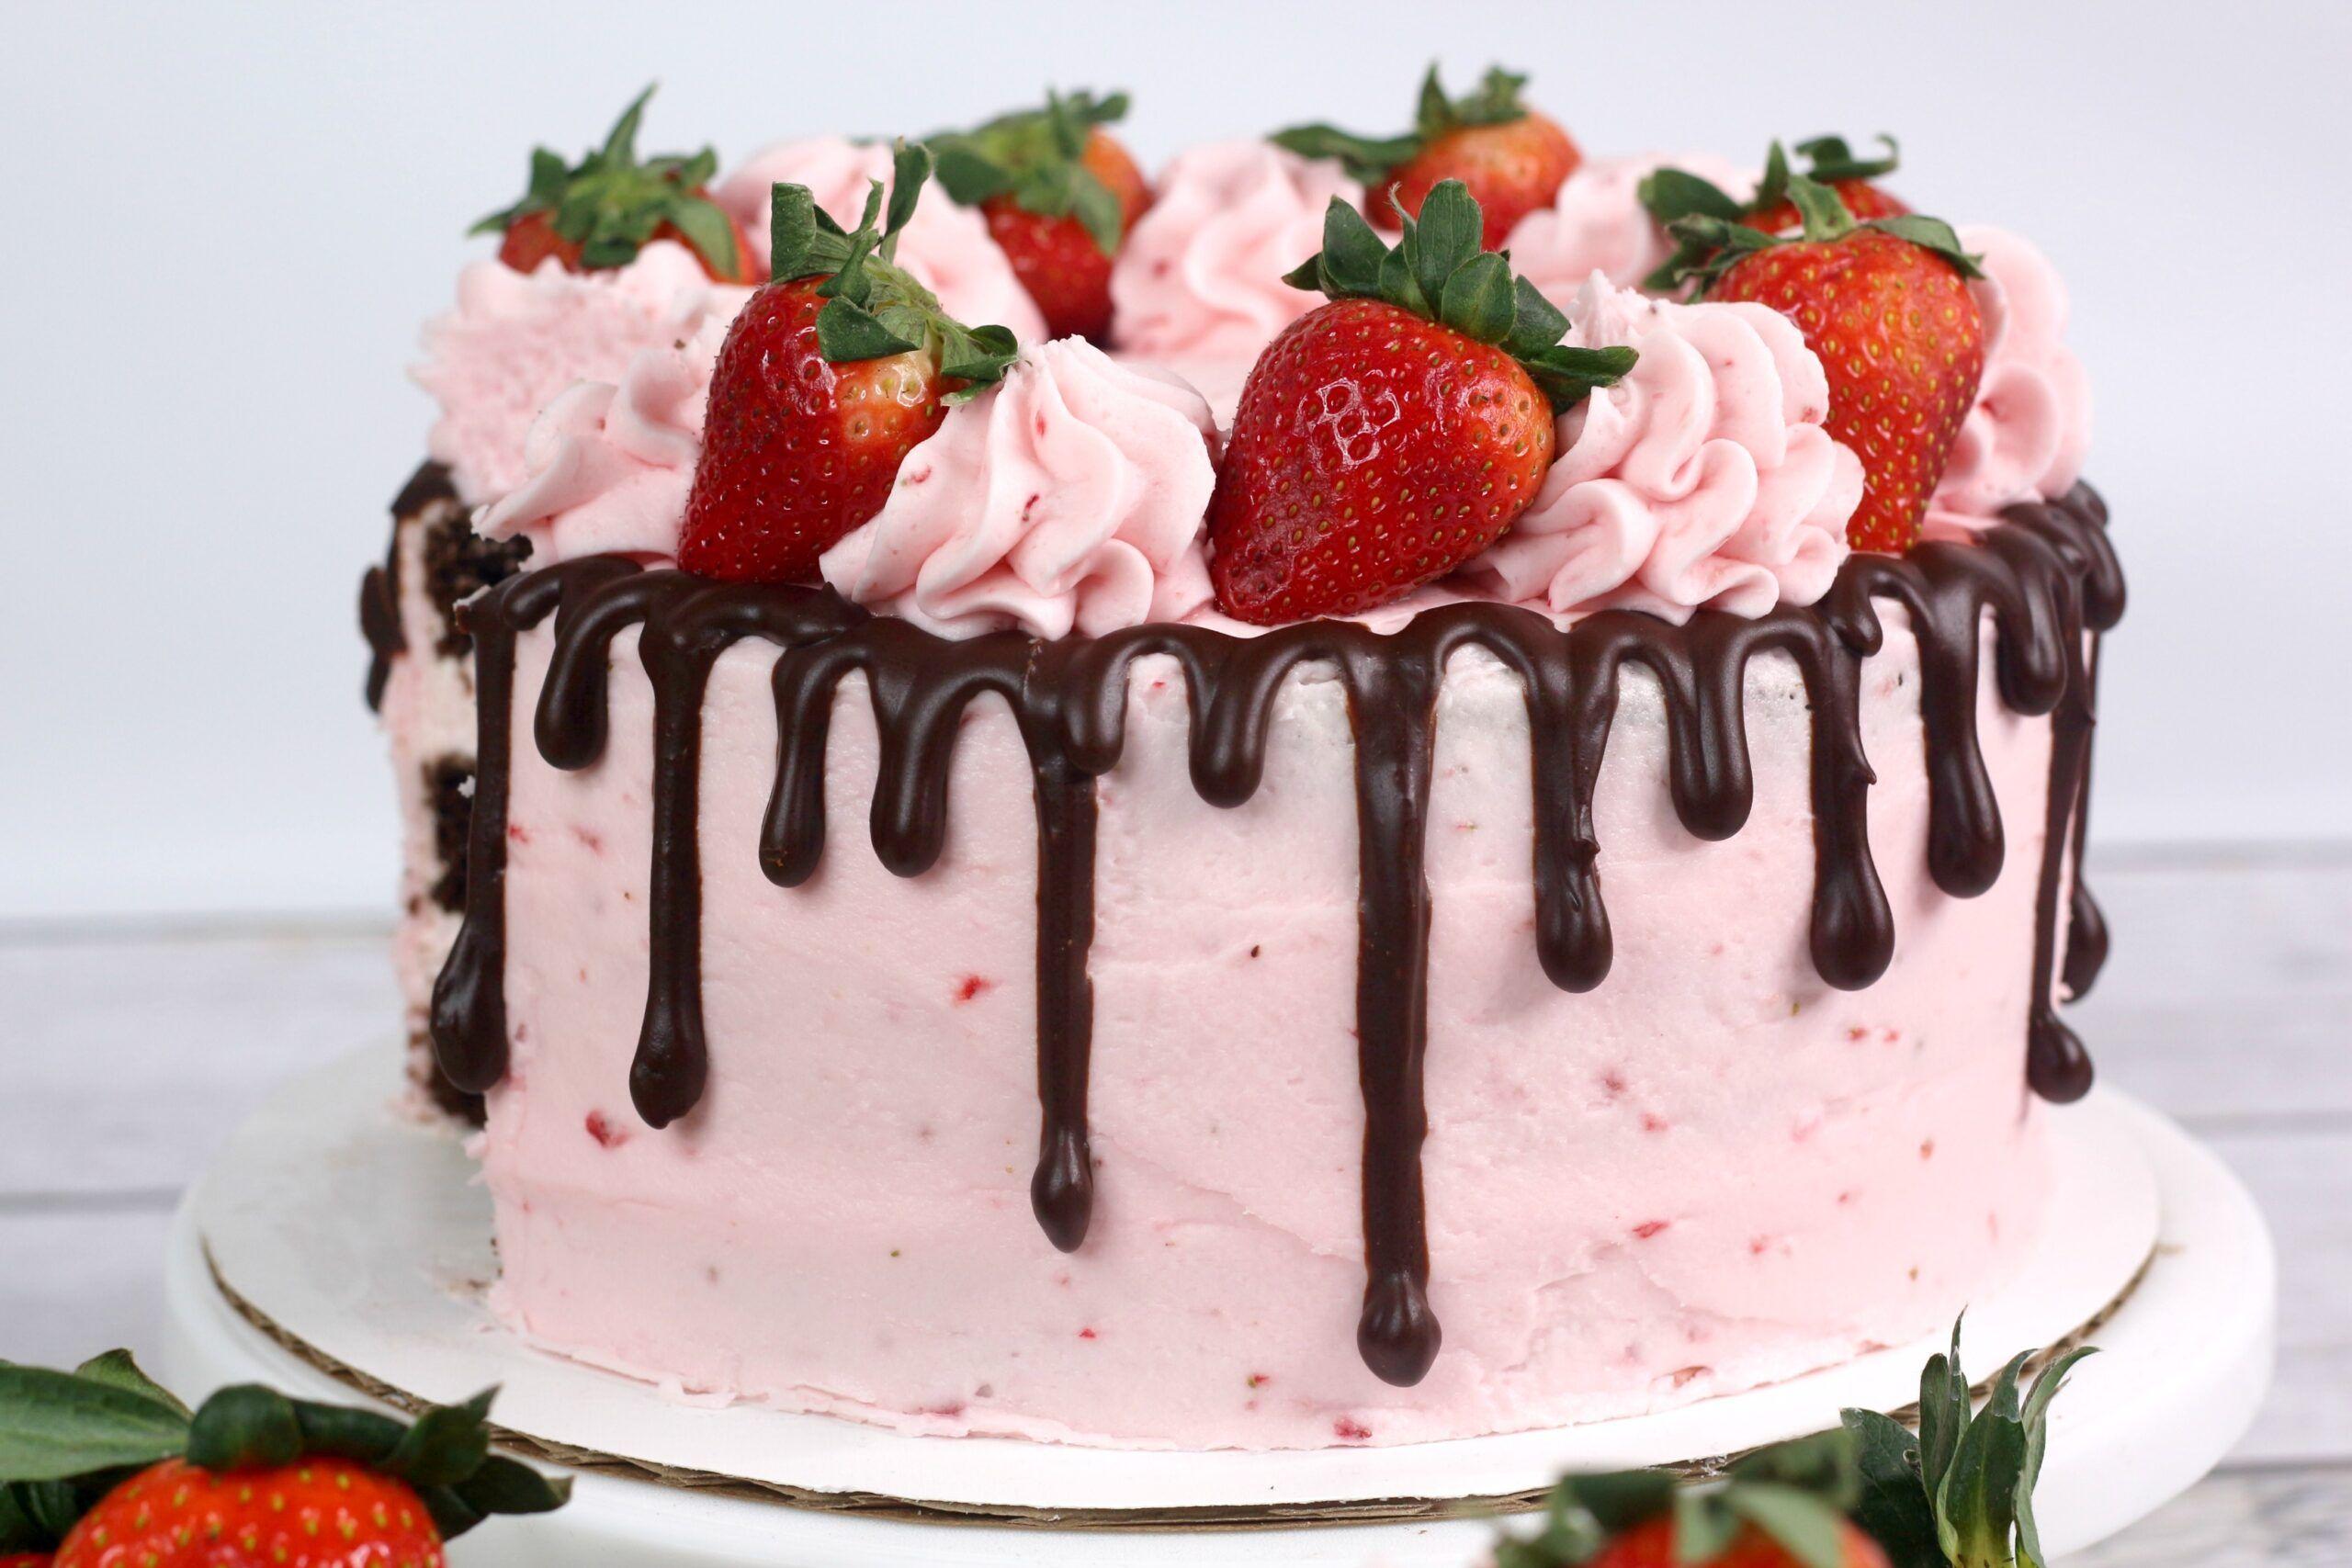 Phenomenal Chocolate Kahlua Cake With Strawberry Buttercream Frosting Funny Birthday Cards Online Elaedamsfinfo